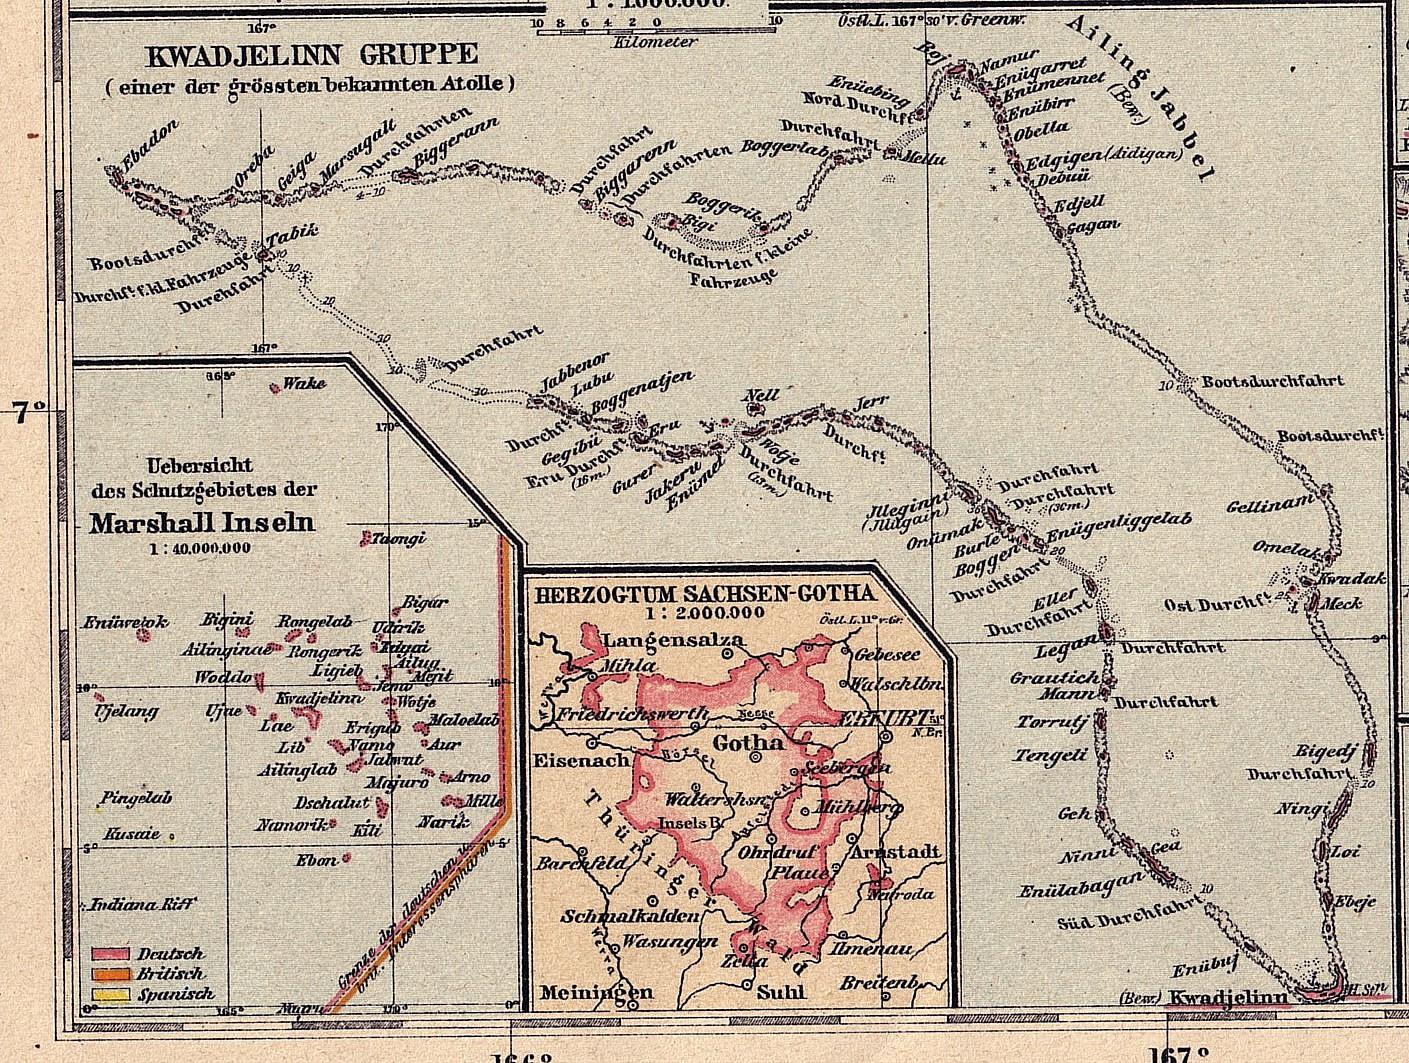 Dirk HR Spennemann (ed.), Historic Maps of the German Marshall ... Kwajalein Map on baghdad map, battle of kwajalein, london map, nouakchott map, pacific campaign map, johnston atoll, samoa map, atoll islands map, tarawa atoll, gb map, battle of eniwetok, guadalcanal island map, german cruiser prinz eugen, truk lagoon, majuro map, new ireland island map, eniwetok map, wwii guadalcanal map, marshall islands map, wake island, ebeye map, bucholz army airfield, pagan island map, battle of surigao strait map, marshall islands, tokyo map, ronald reagan ballistic missile defense test site, jaluit atoll map, barking sands kauai map, iran map,